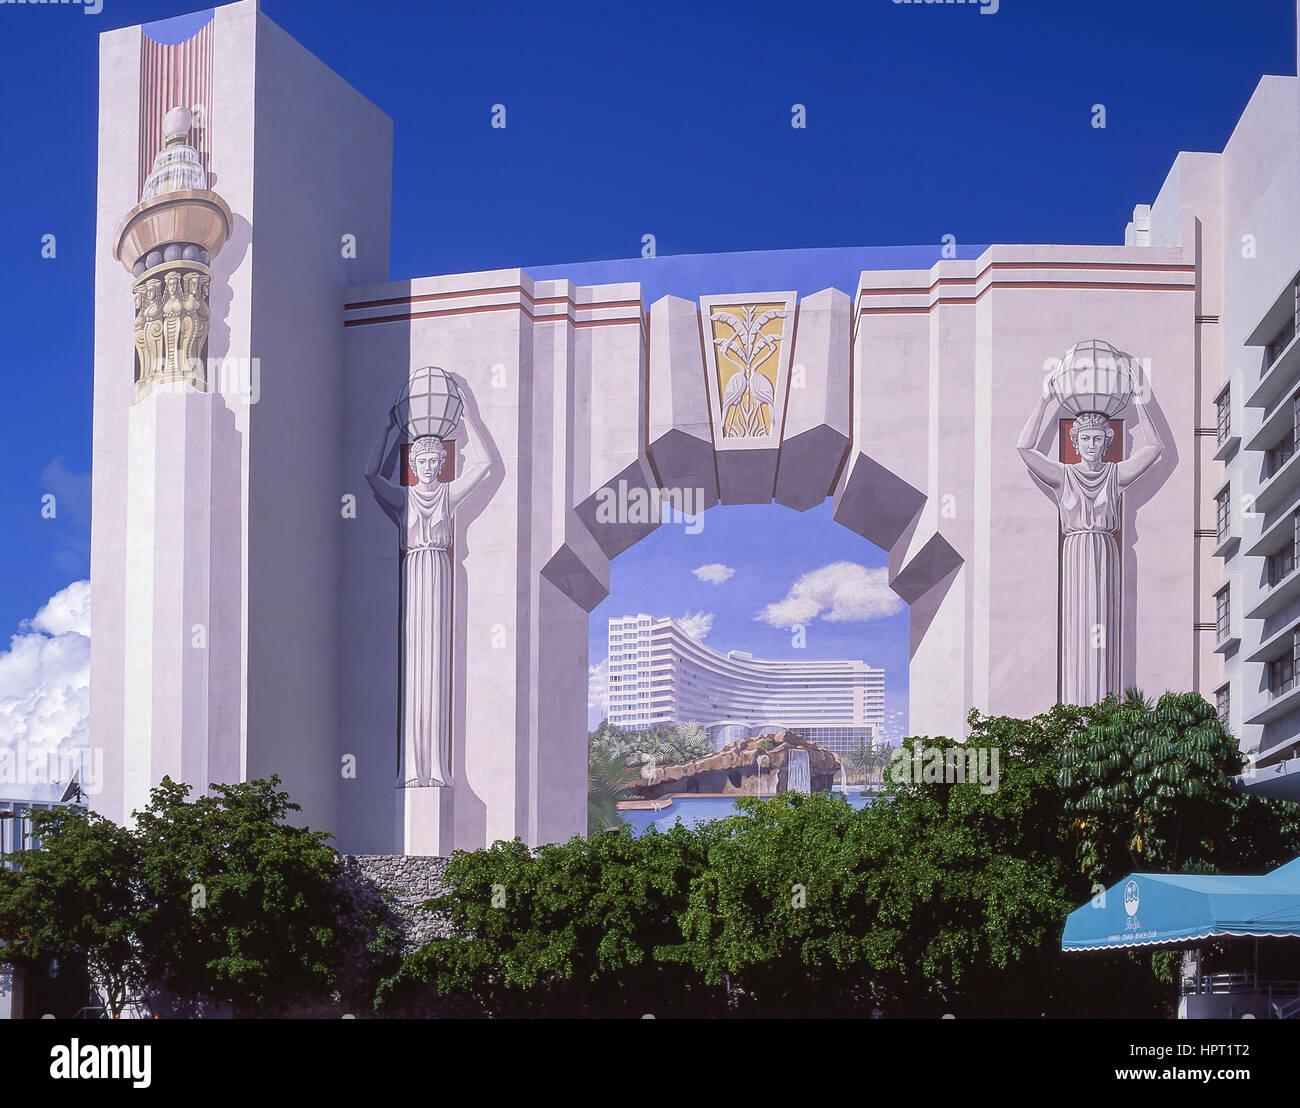 Finest Art Deco Trompeluil Mural Hotel Collins Avenue